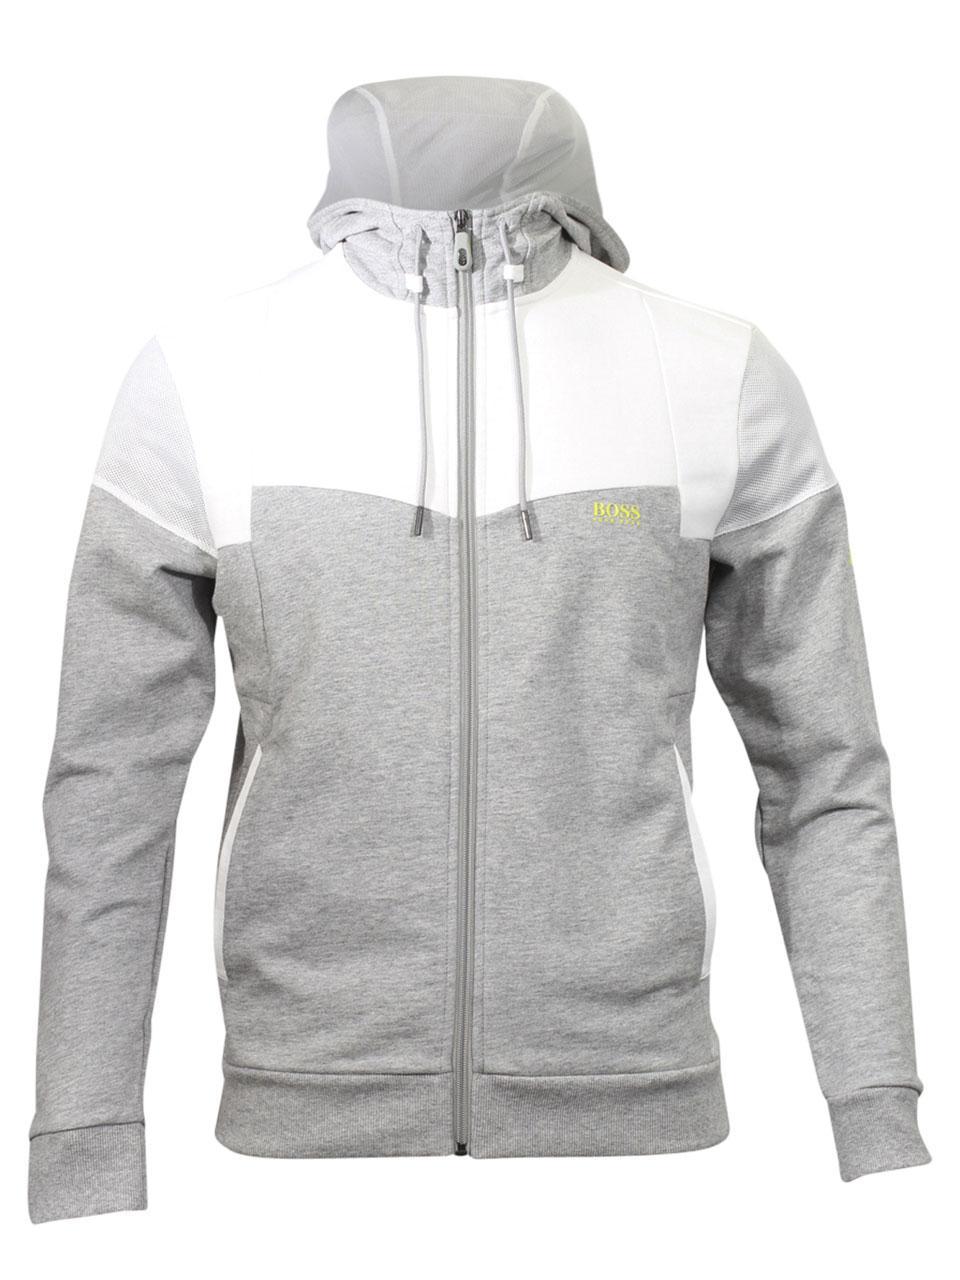 259b4e941c Hugo Boss Men's Saggy-1 Hooded Cotton Sweatshirt Zip-Jacket